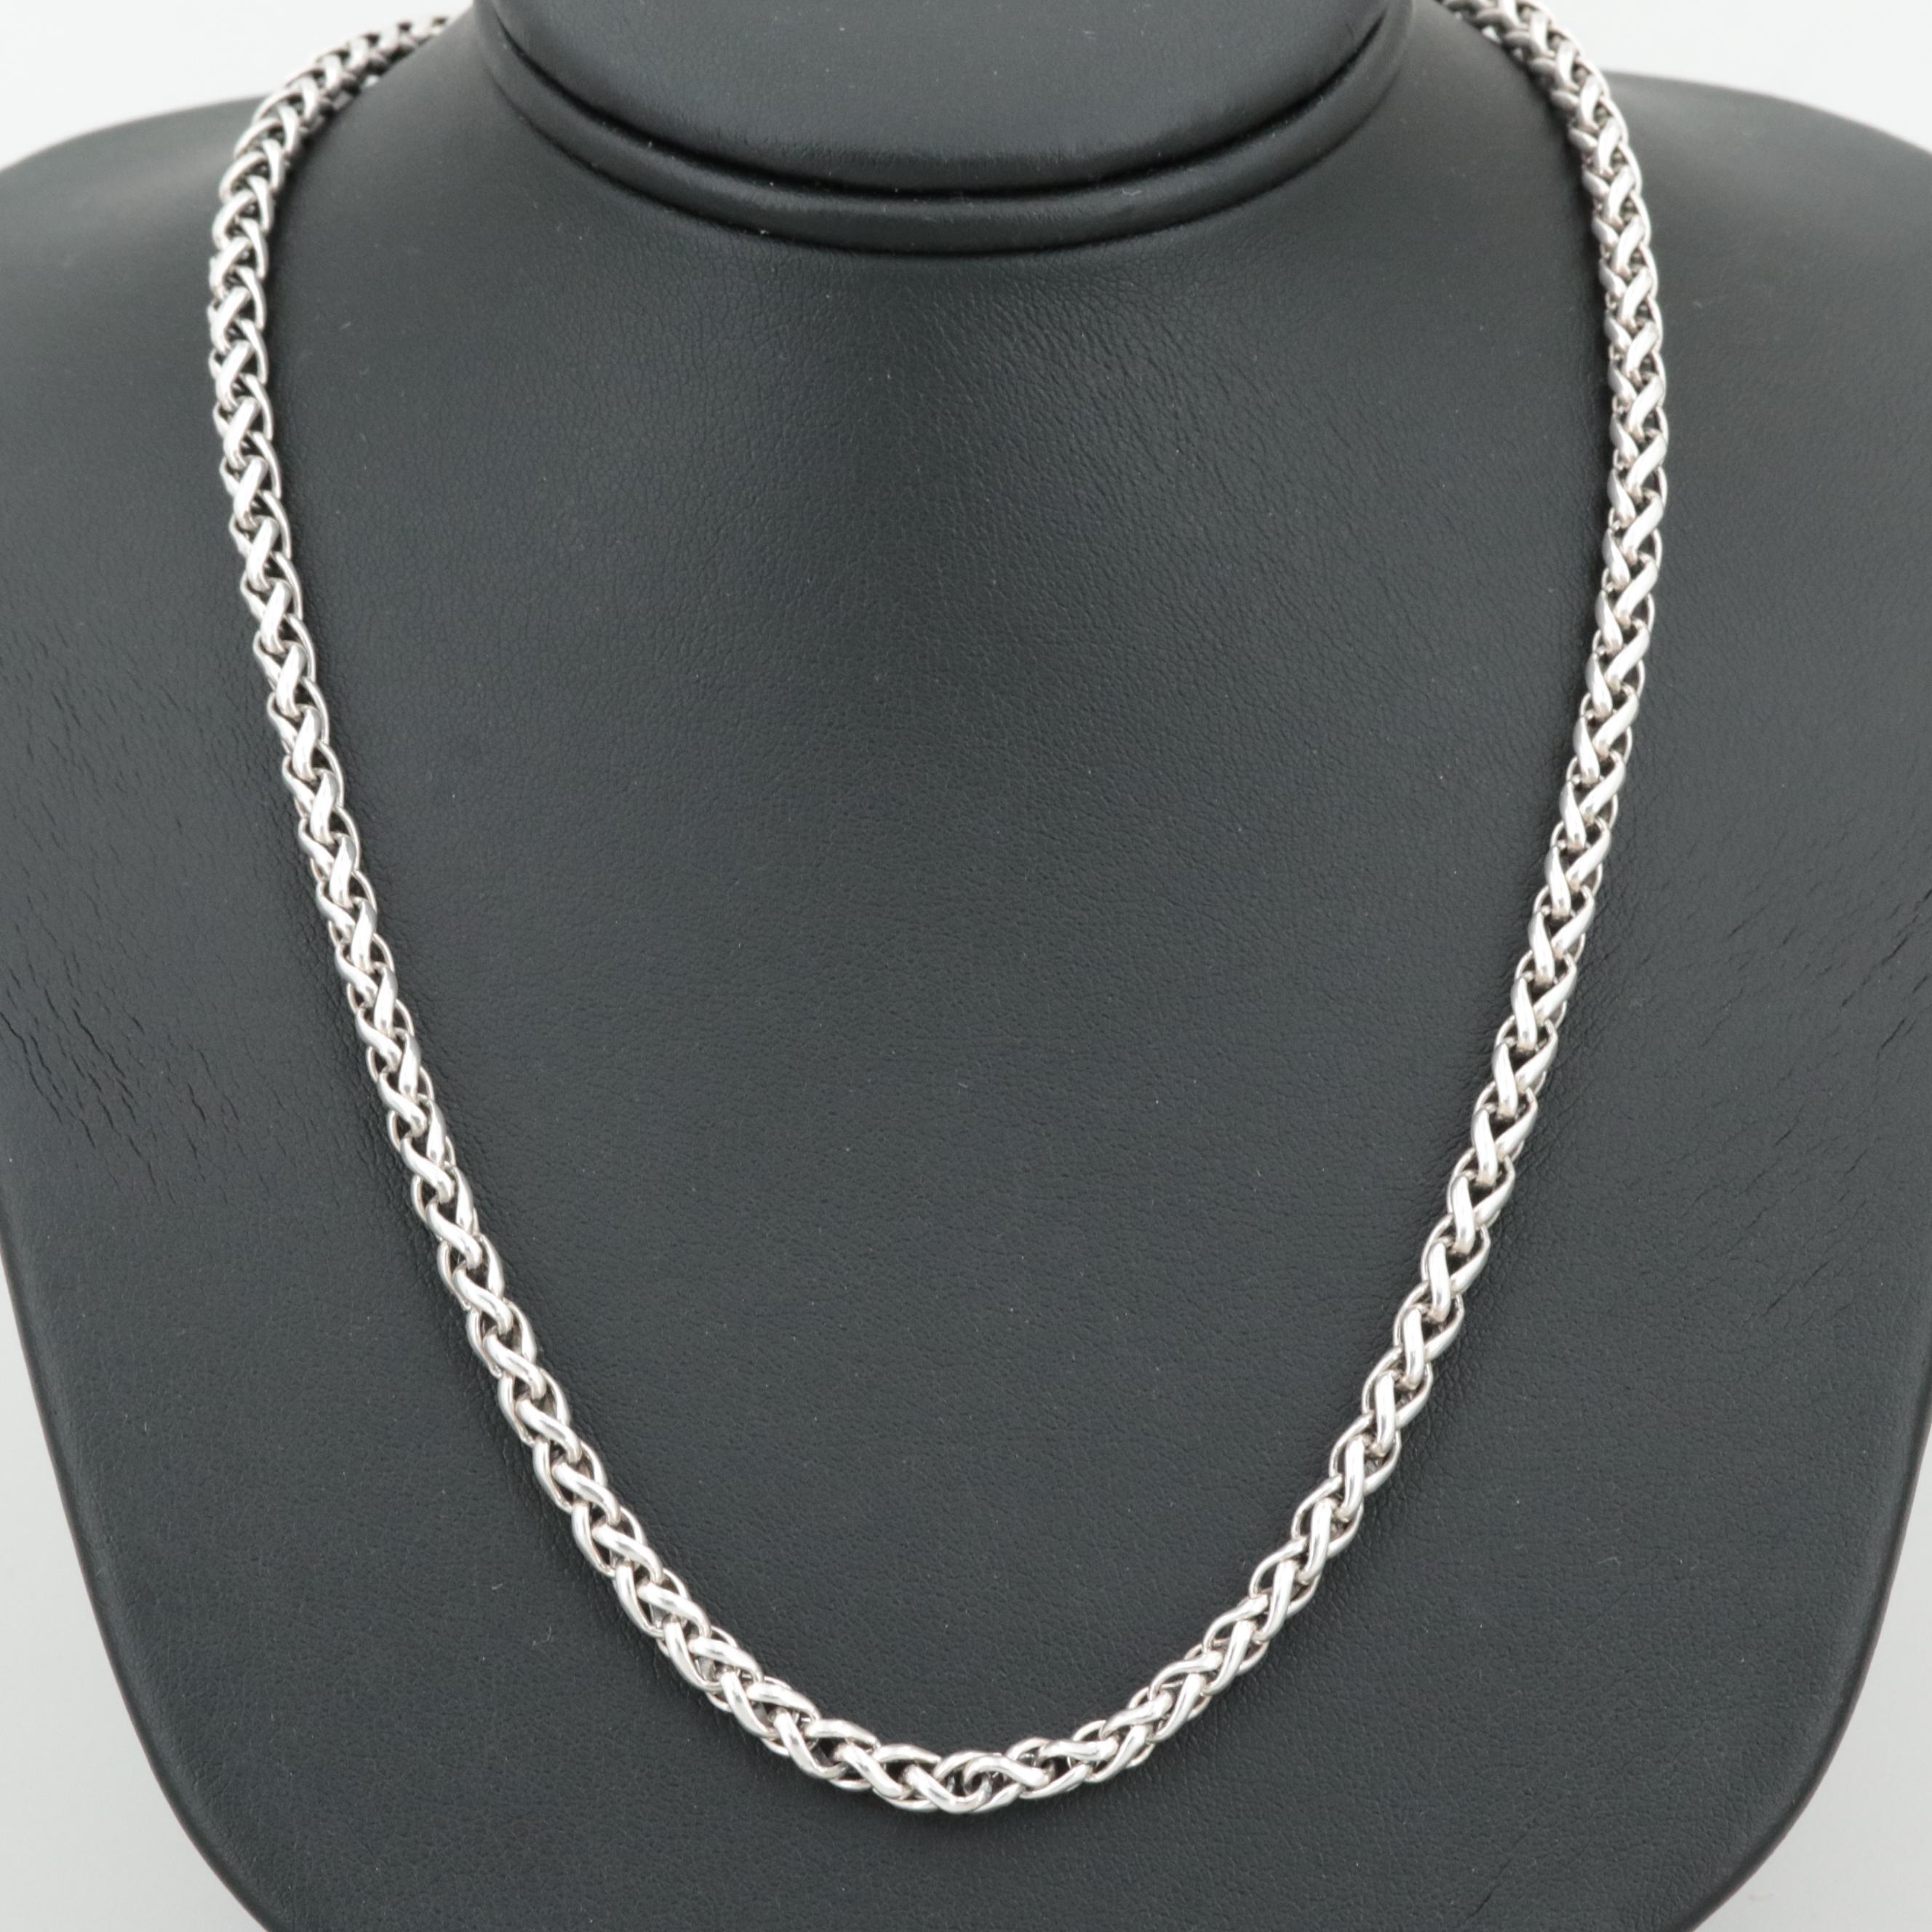 David Yurman Sterling Silver Wheat Link Chain